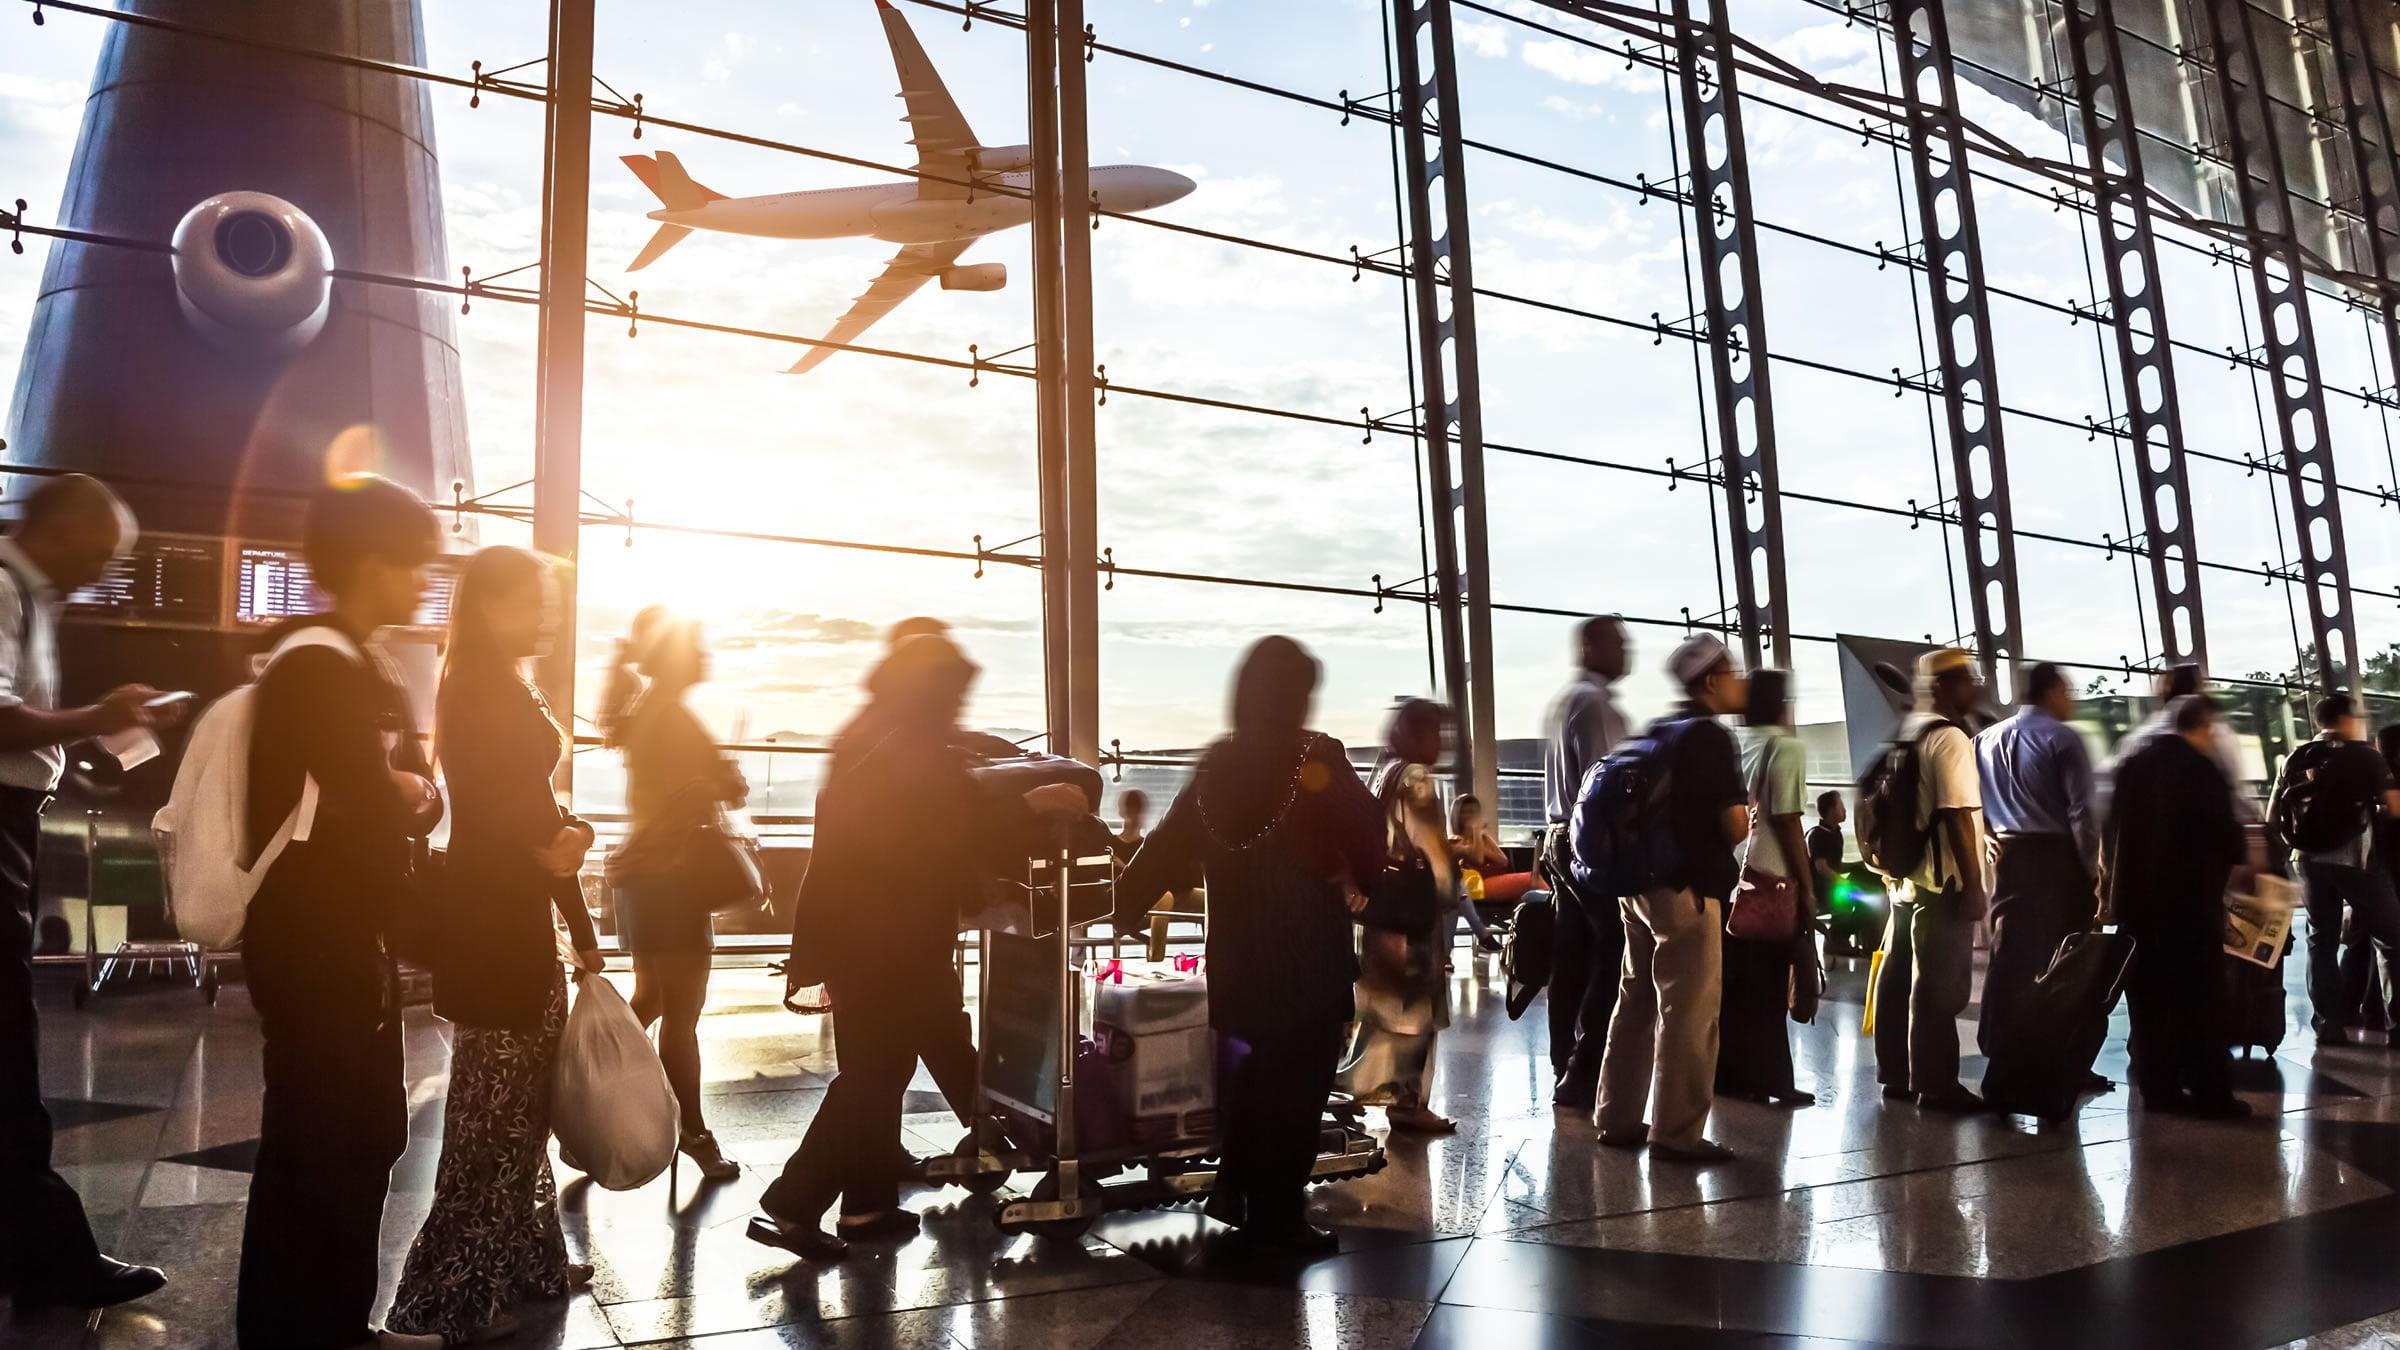 ¿Cuáles son tus derechos como pasajero aéreo?